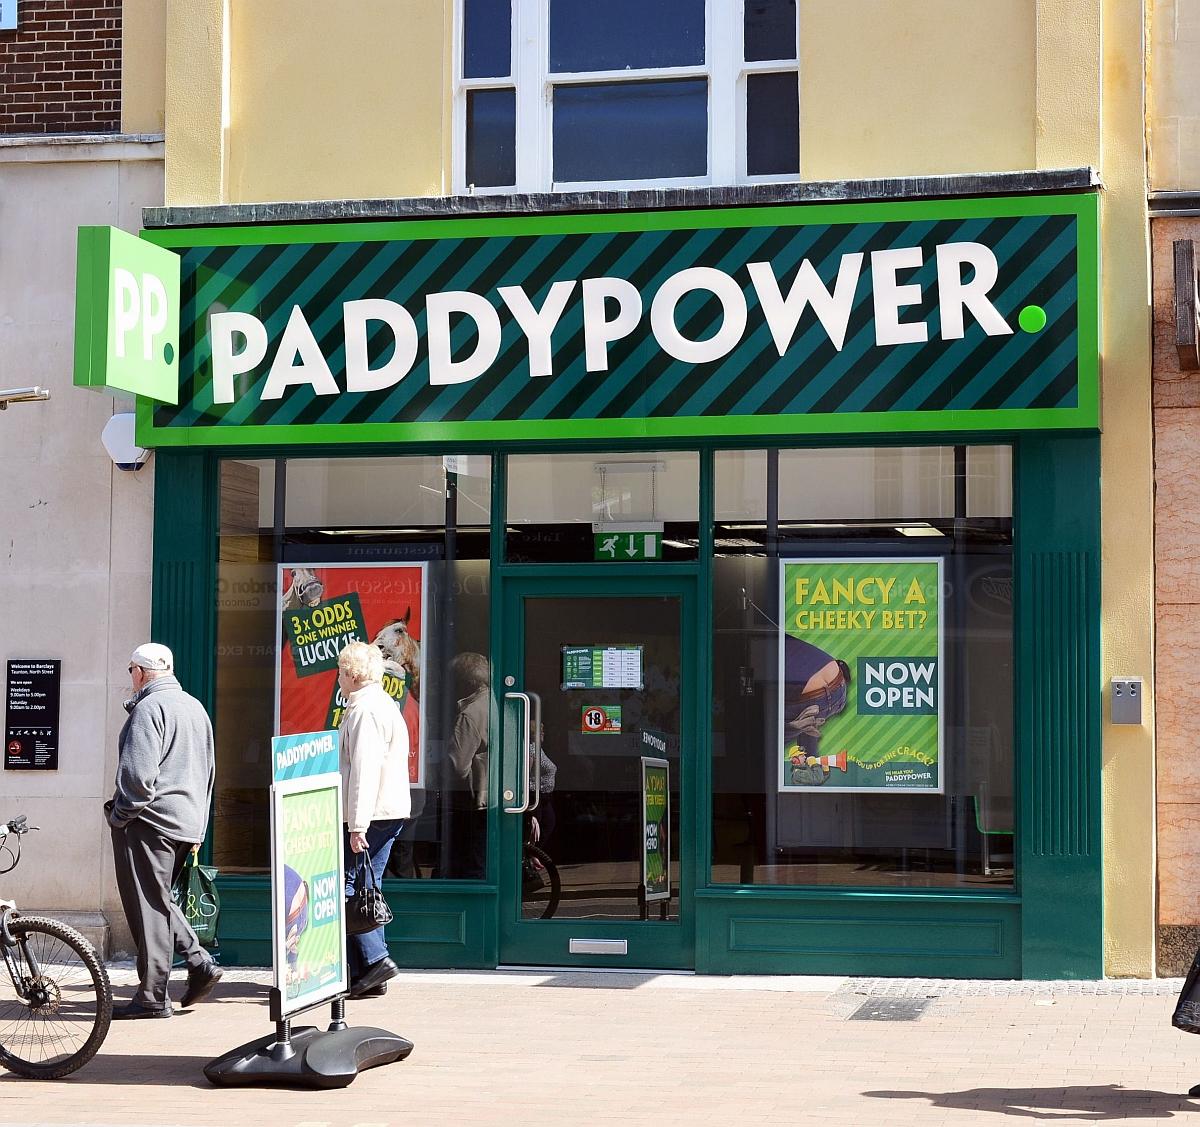 Paddy power uk betting shops online bhutan vs bangladesh bettingexpert football